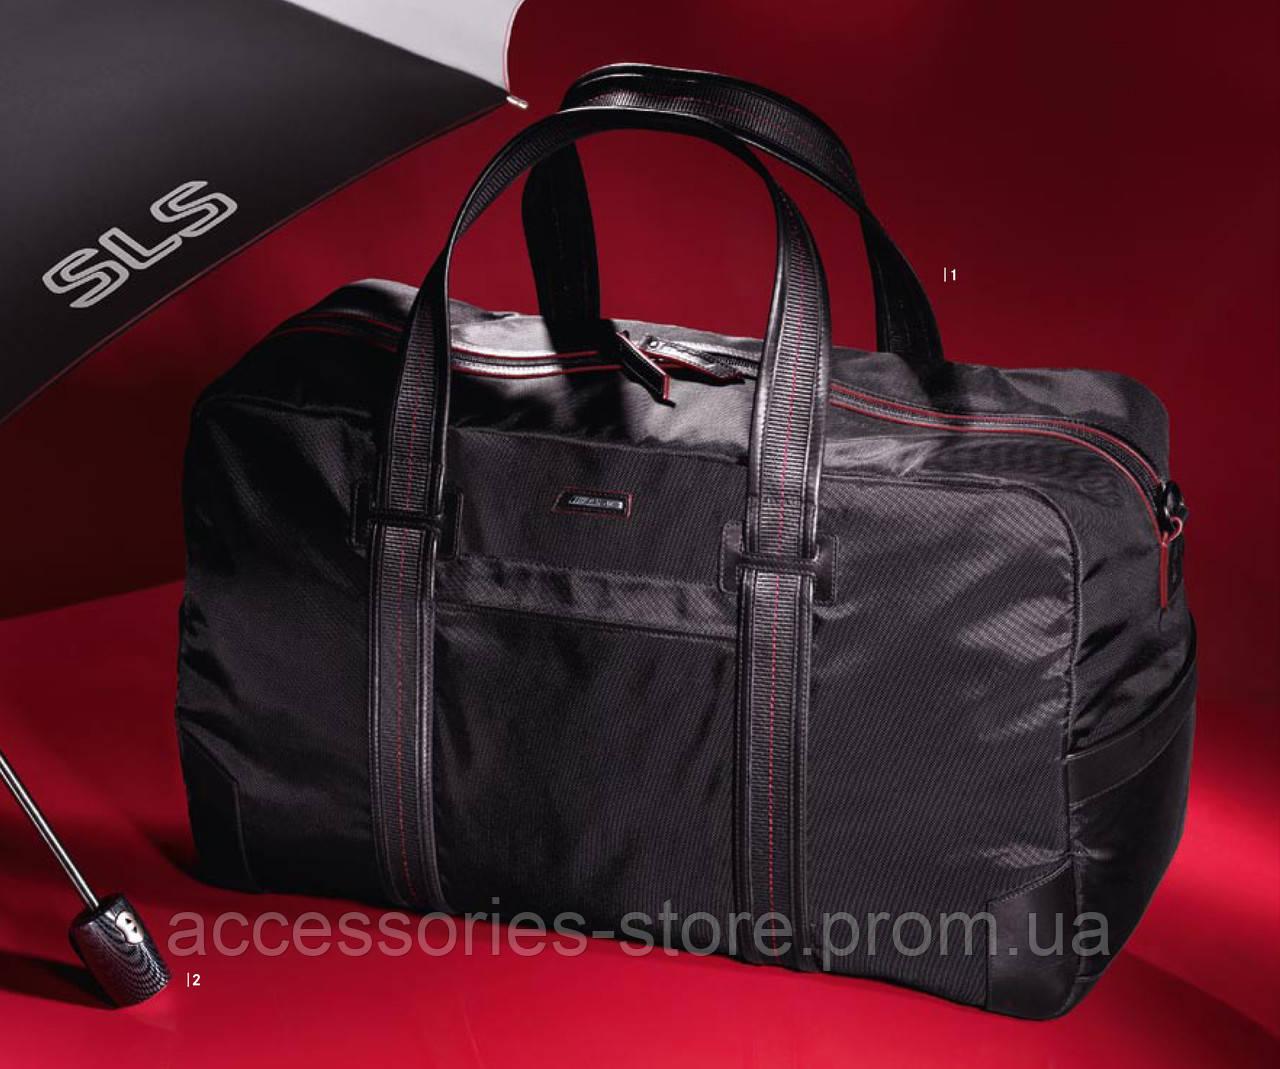 Складной зонт Mercedes-Benz SLS AMG Compact Umbrella Black